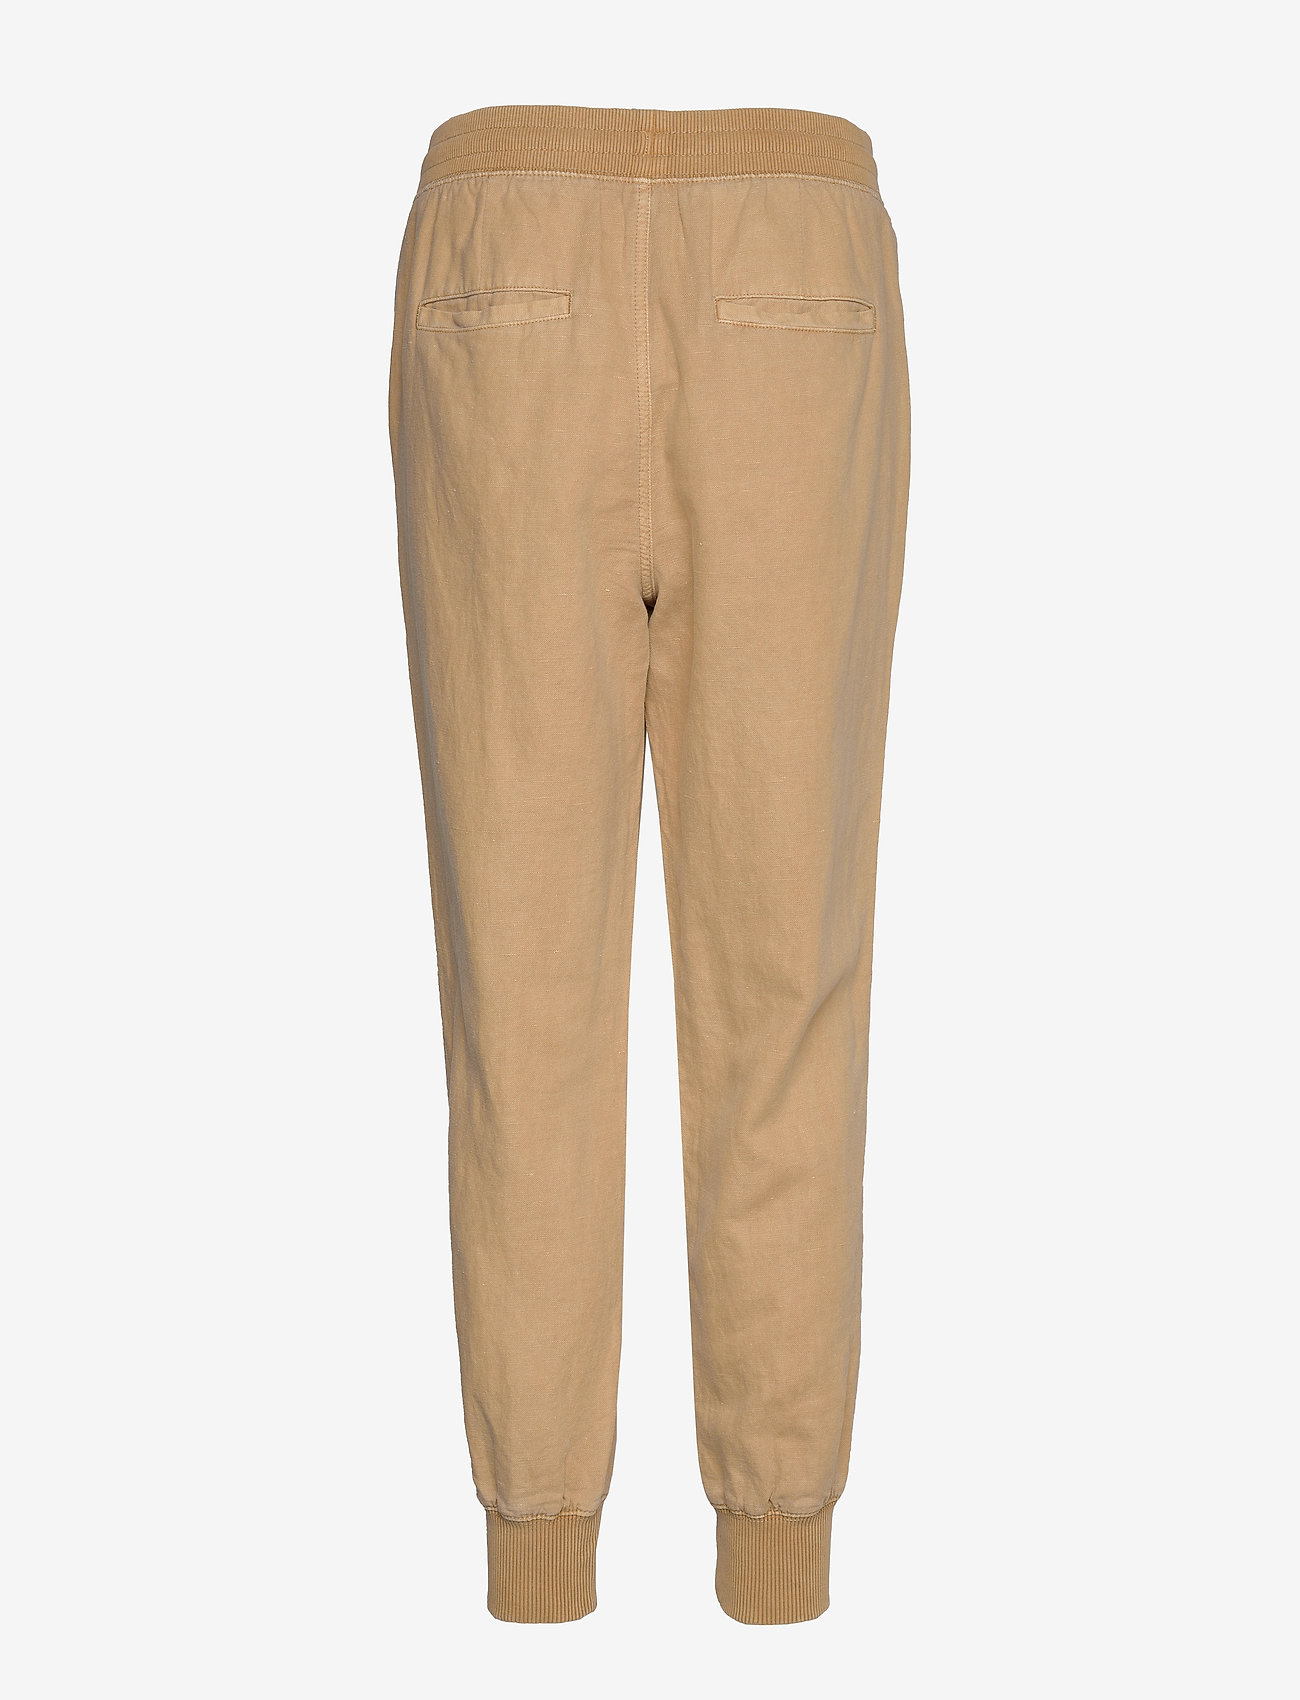 GAP - Utility Joggers in Linen-Cotton - sweatpants - new sand - 1